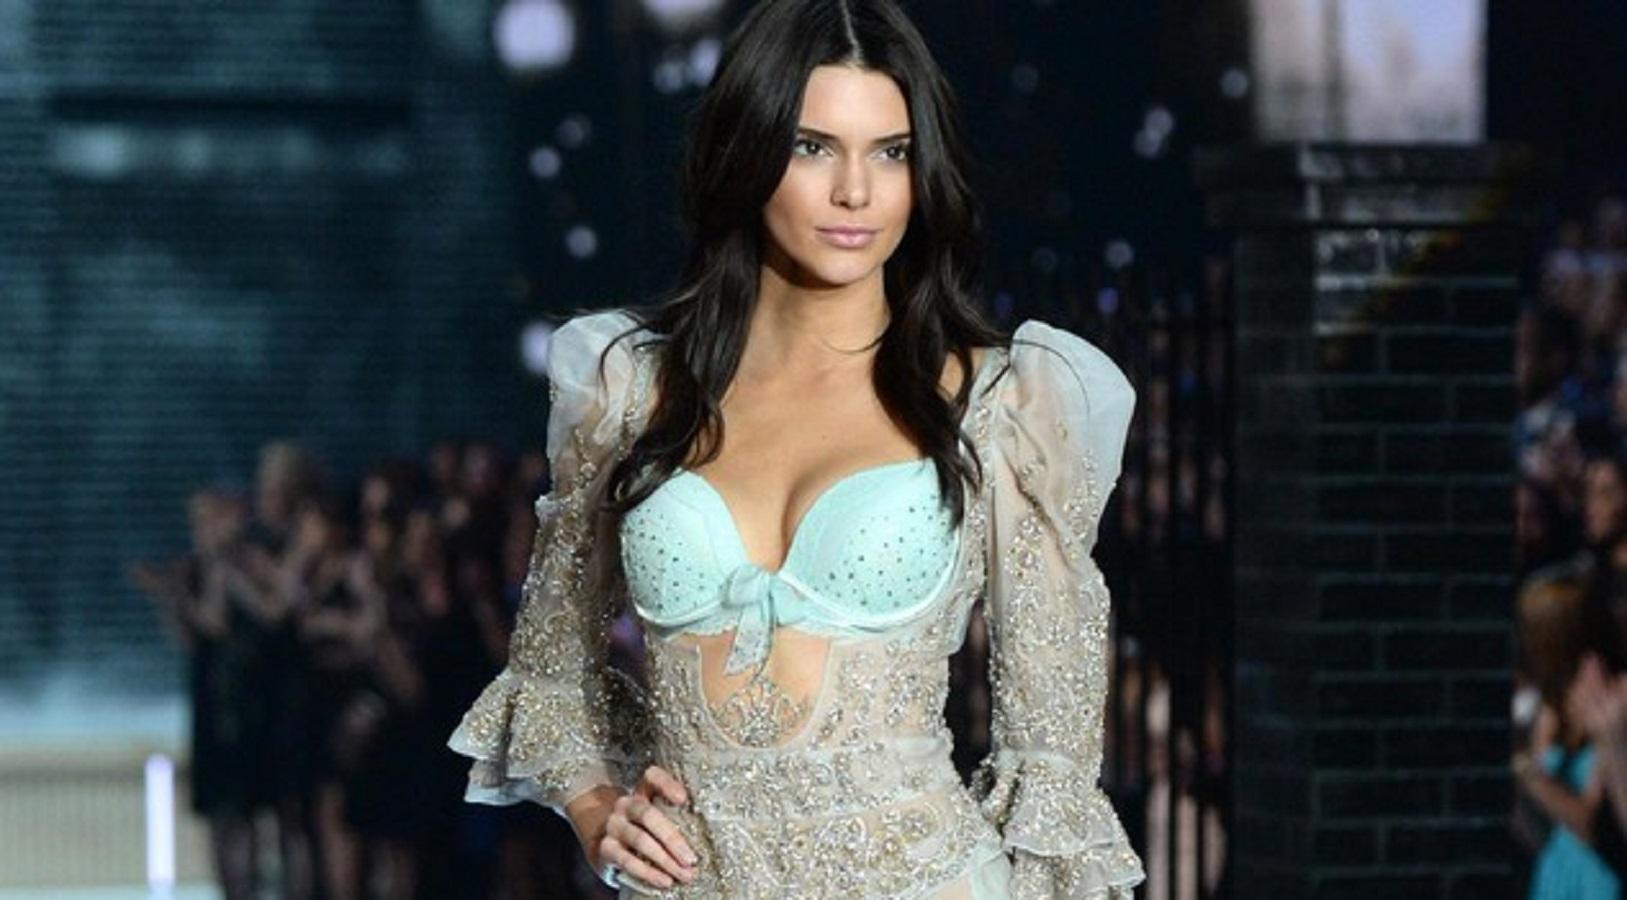 La bevanda detox amata da Kendall Jenner